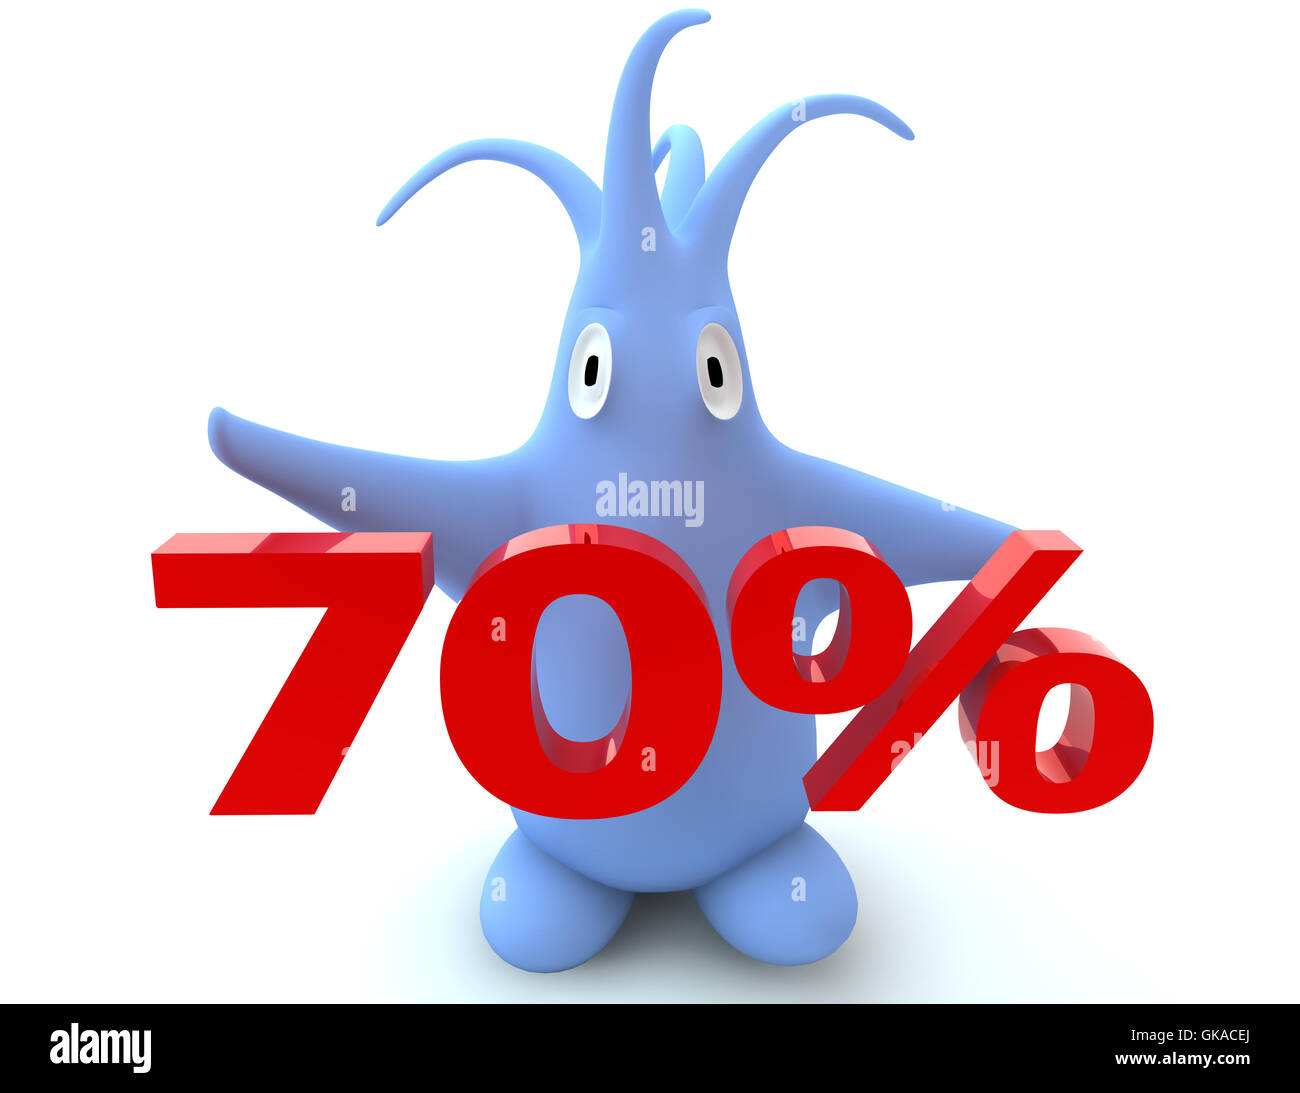 bargain buy reduced percentage - Stock Image